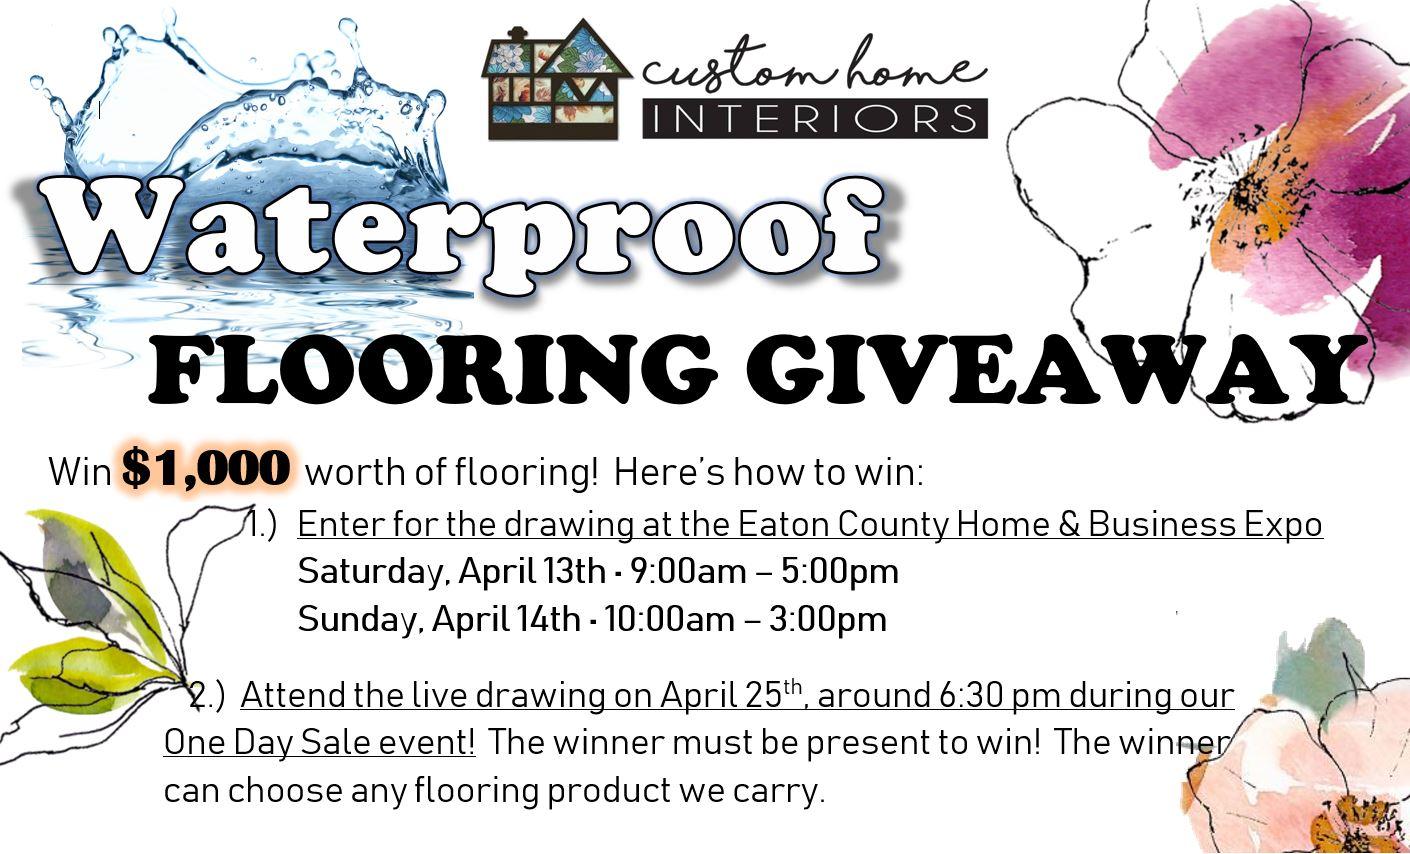 Waterproof Flooring Giveaway Flier